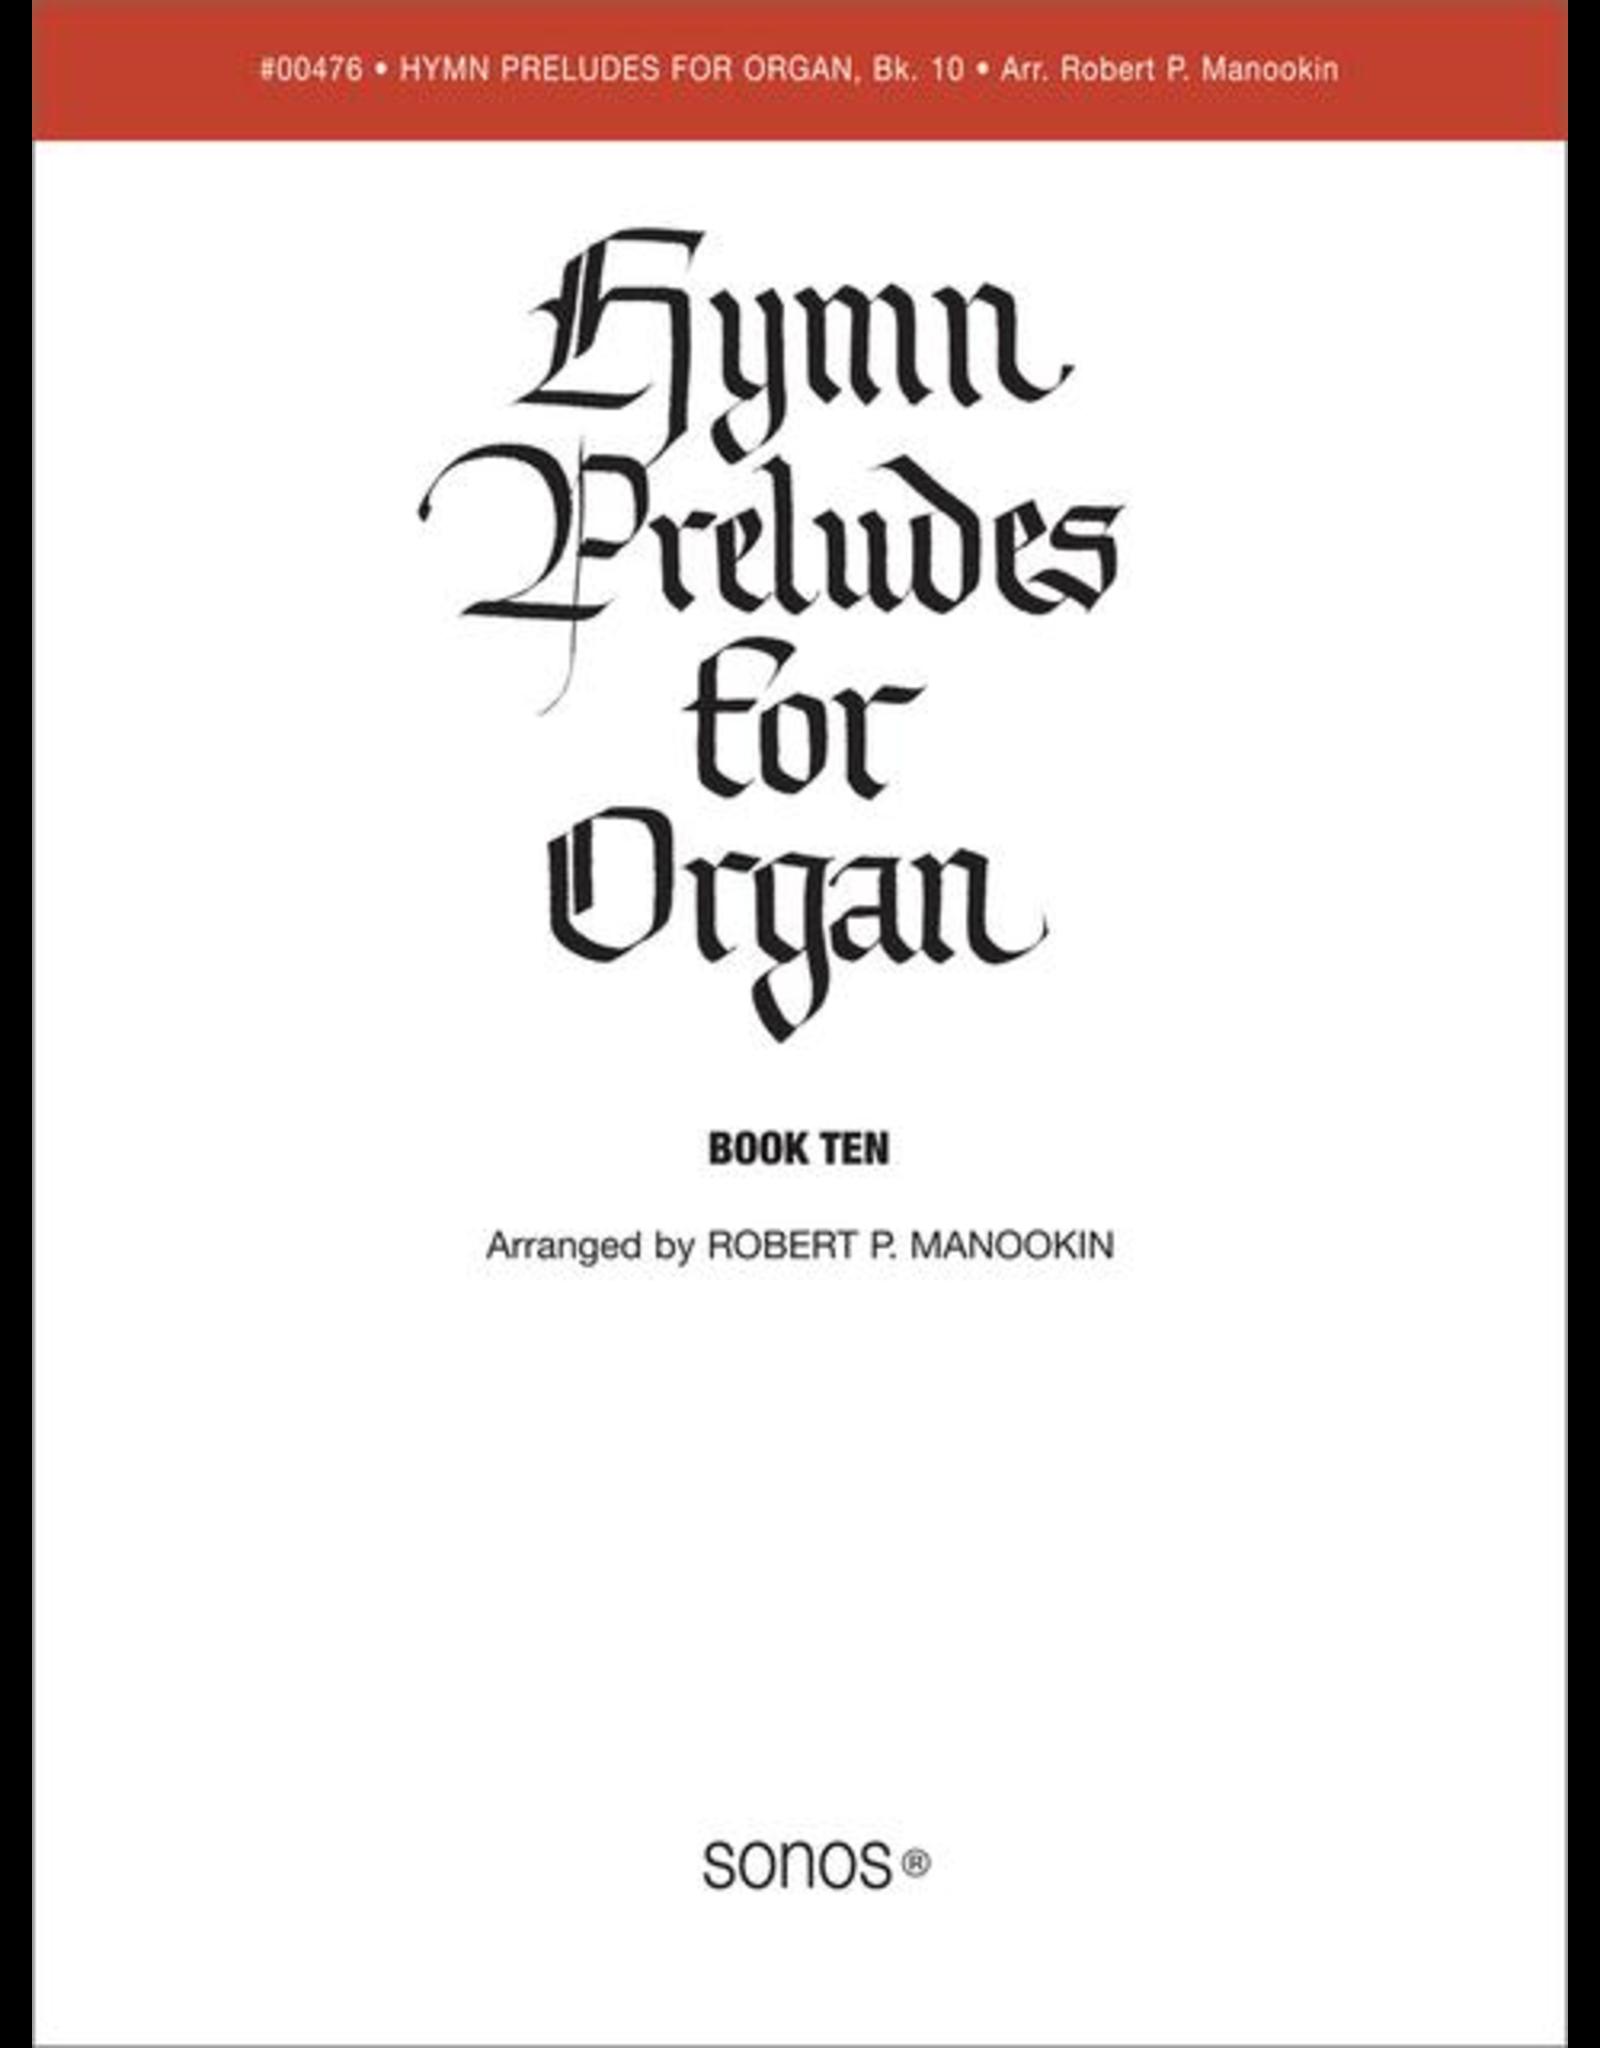 Jackman Music Hymn Preludes for Organ Book 10 (Christmas) arr. Robert P. Manookin